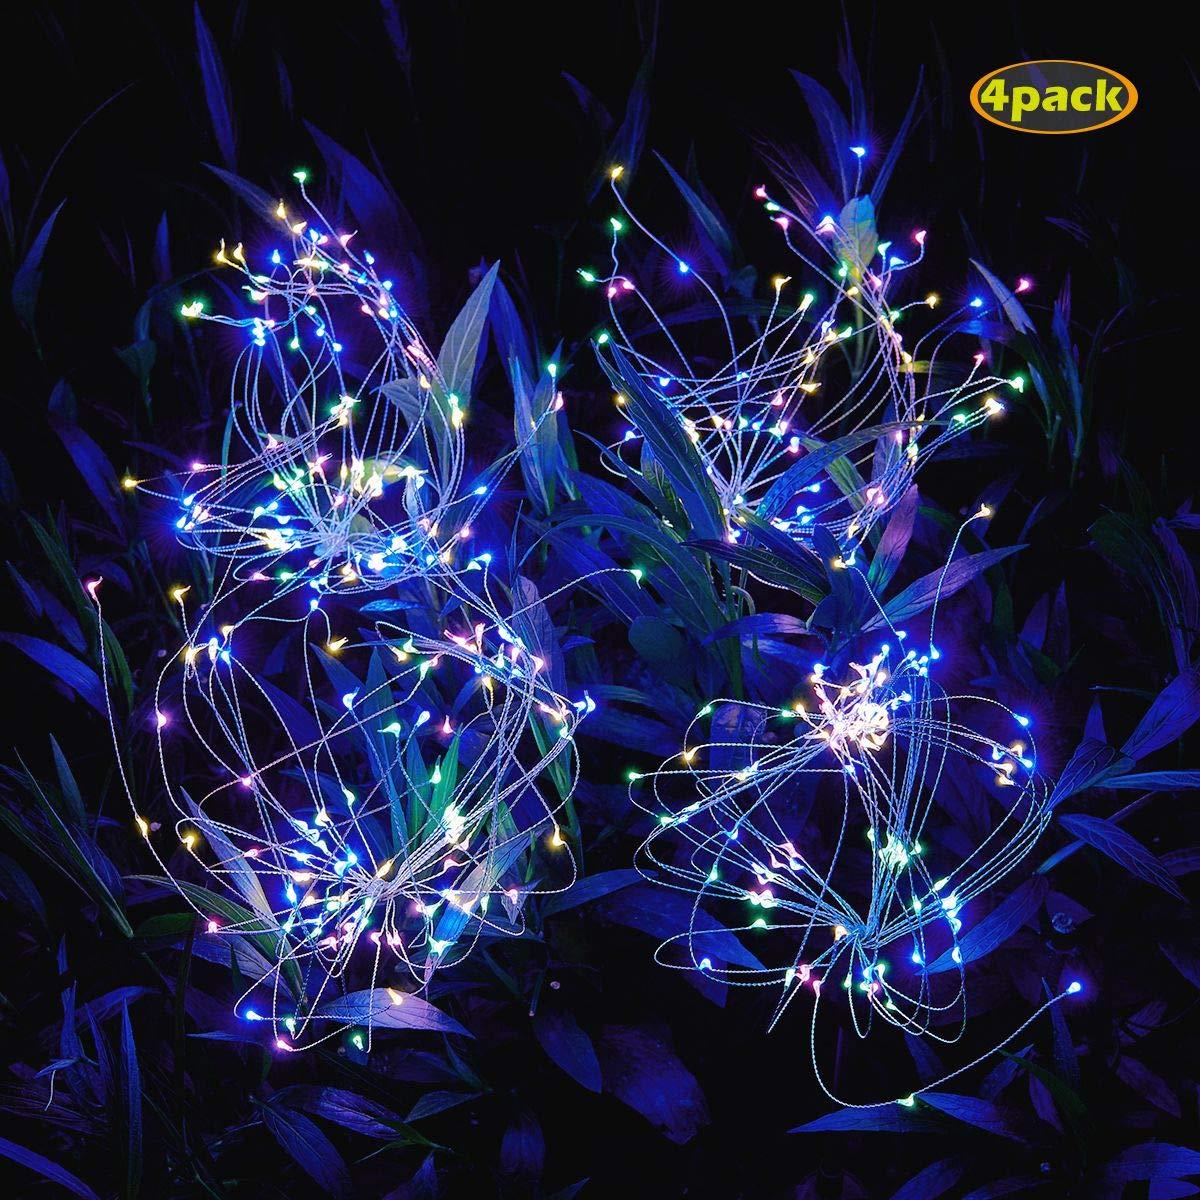 Amashop-Outdoor-Solar-Garden-Lights,105 LED Solar Powered Decorative Stake Landscape Light DIY Flowers Fireworks Stars for Walkway Pathway Backyard Christmas by Amashop